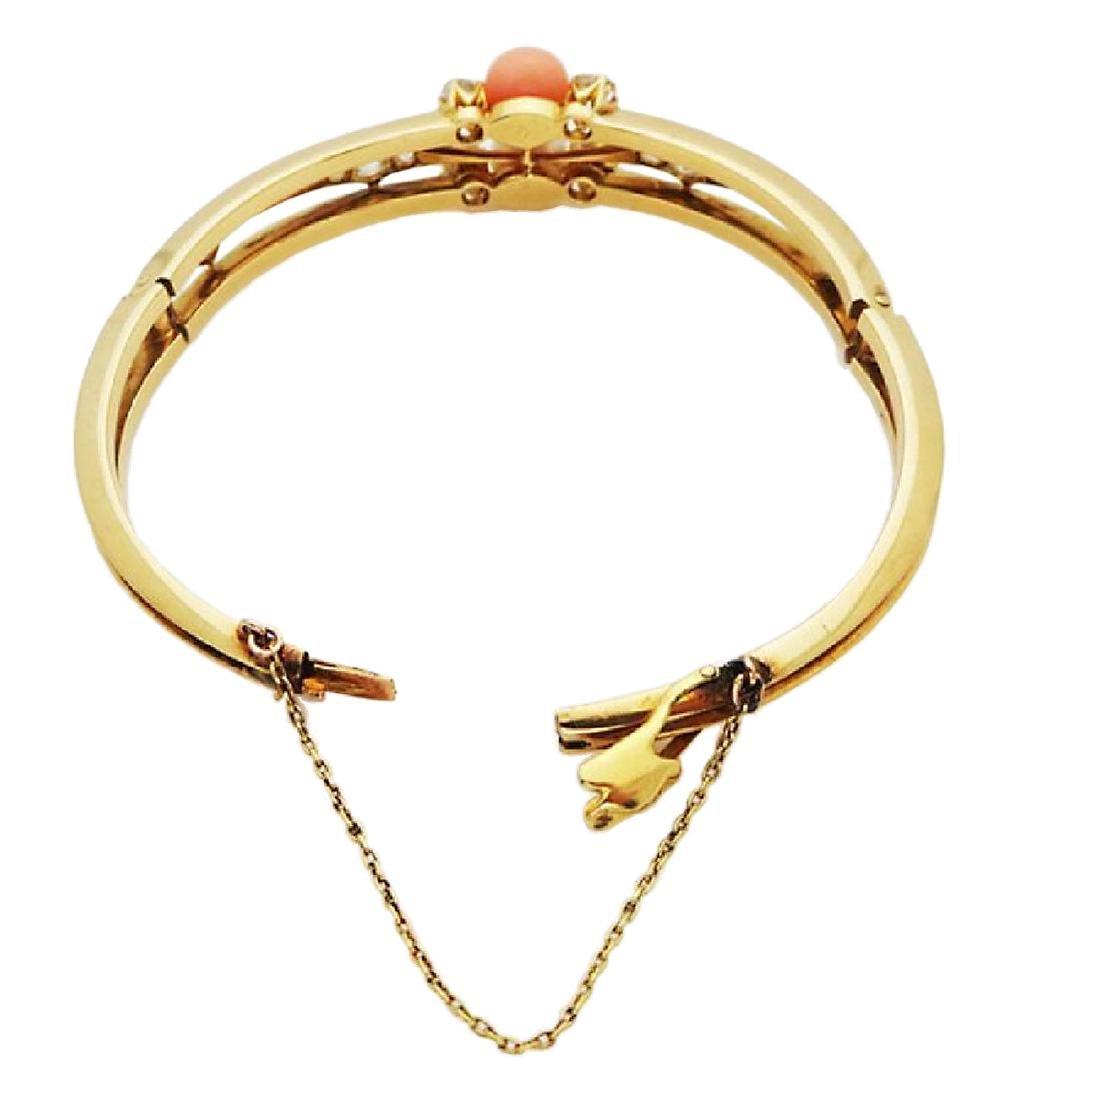 Antique 18K Gold natural Pearl, Coral Diamond Bracelet - 4